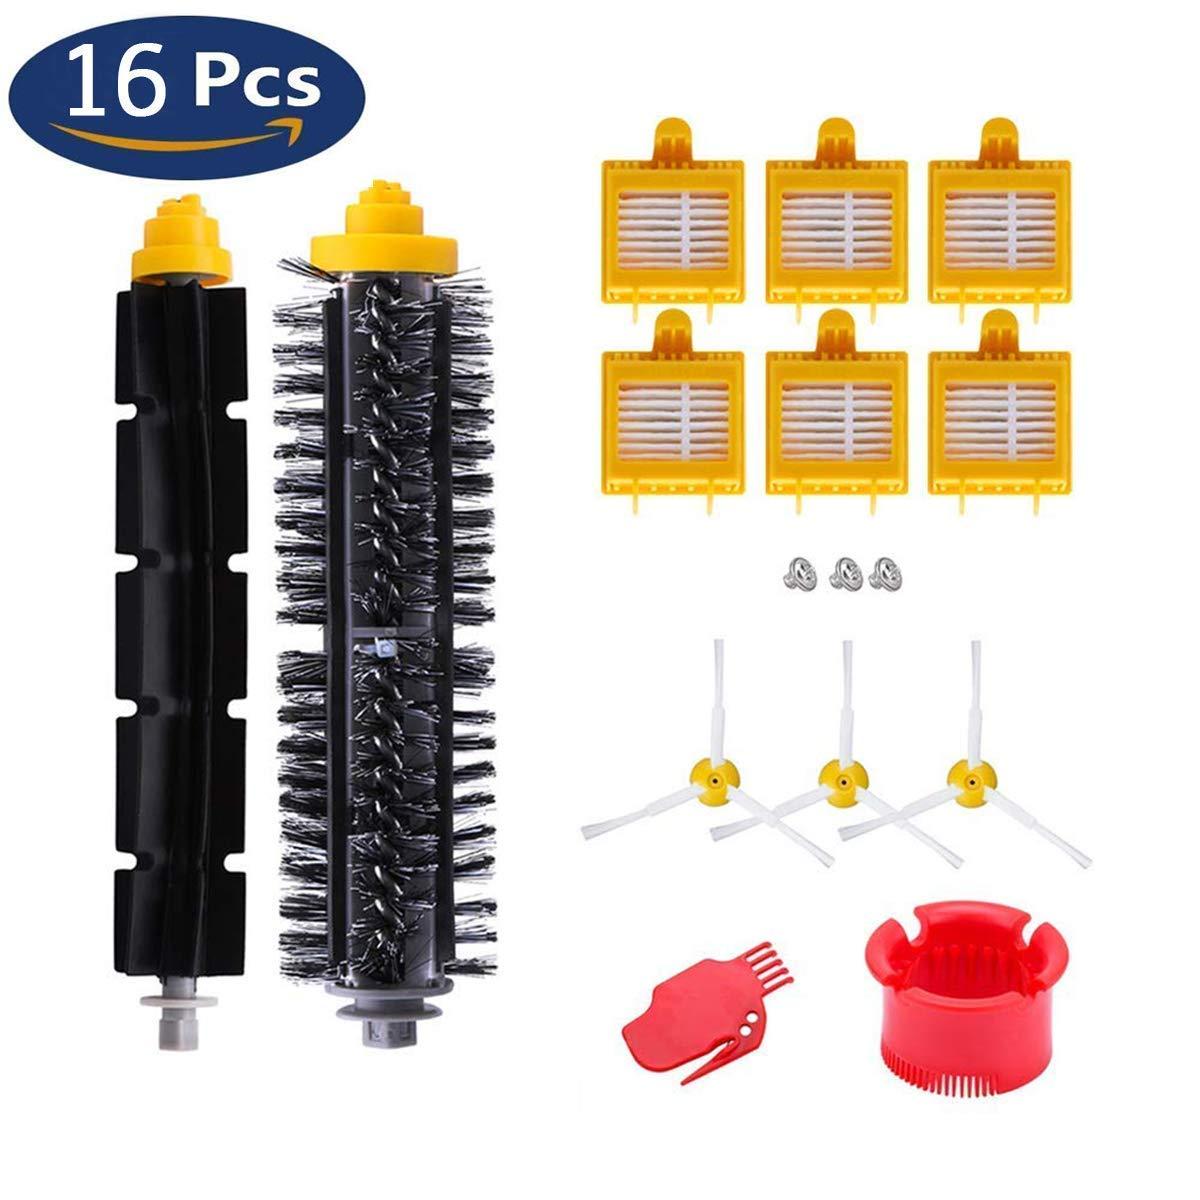 Kit di accesoires per iRobot Aspirapolvere Roomba Serie 600 605 610 615 616 620 625 630 631 639 650 651 660 670 671 680 681 690 YoRiBo